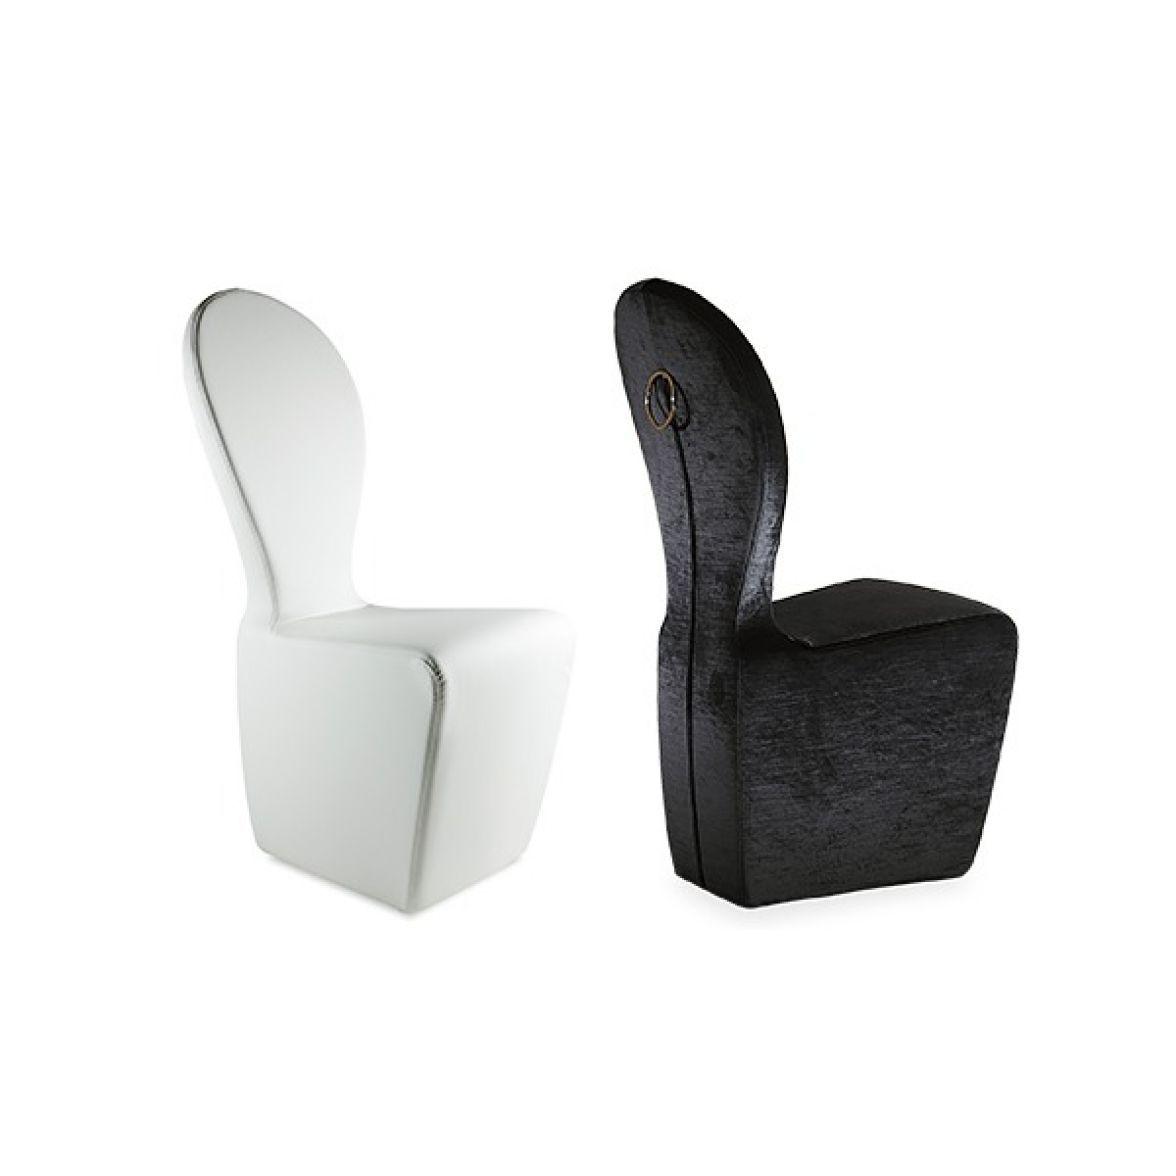 Mondrian chair фото цена